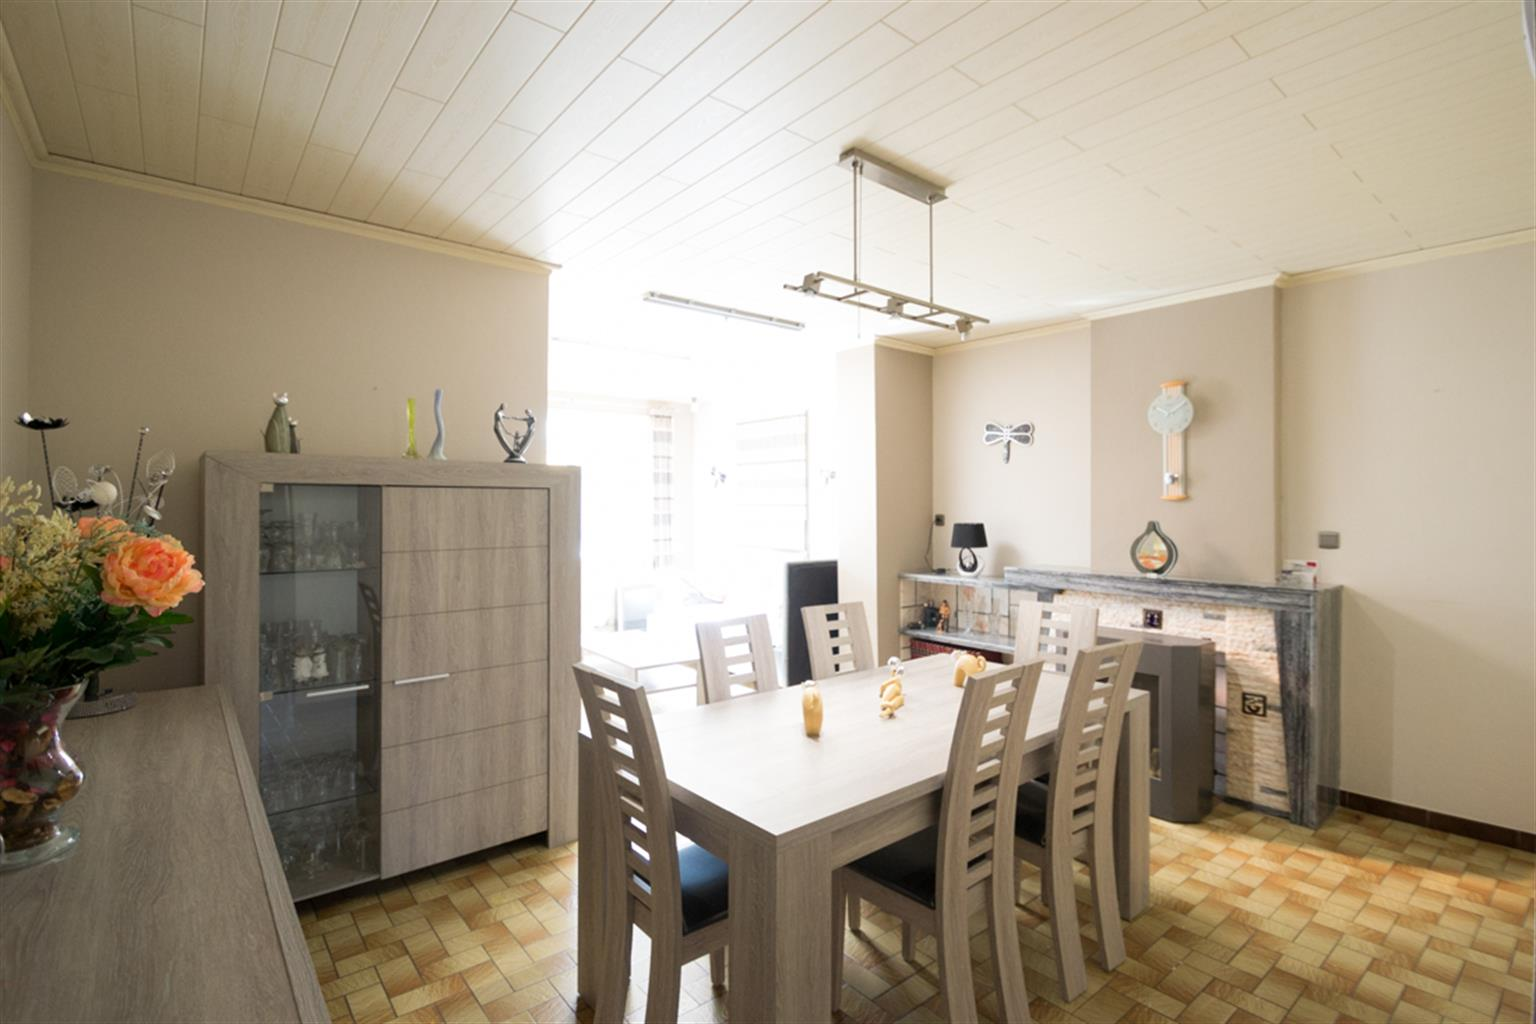 Maison - Leval-Trahegnies - #4345091-2